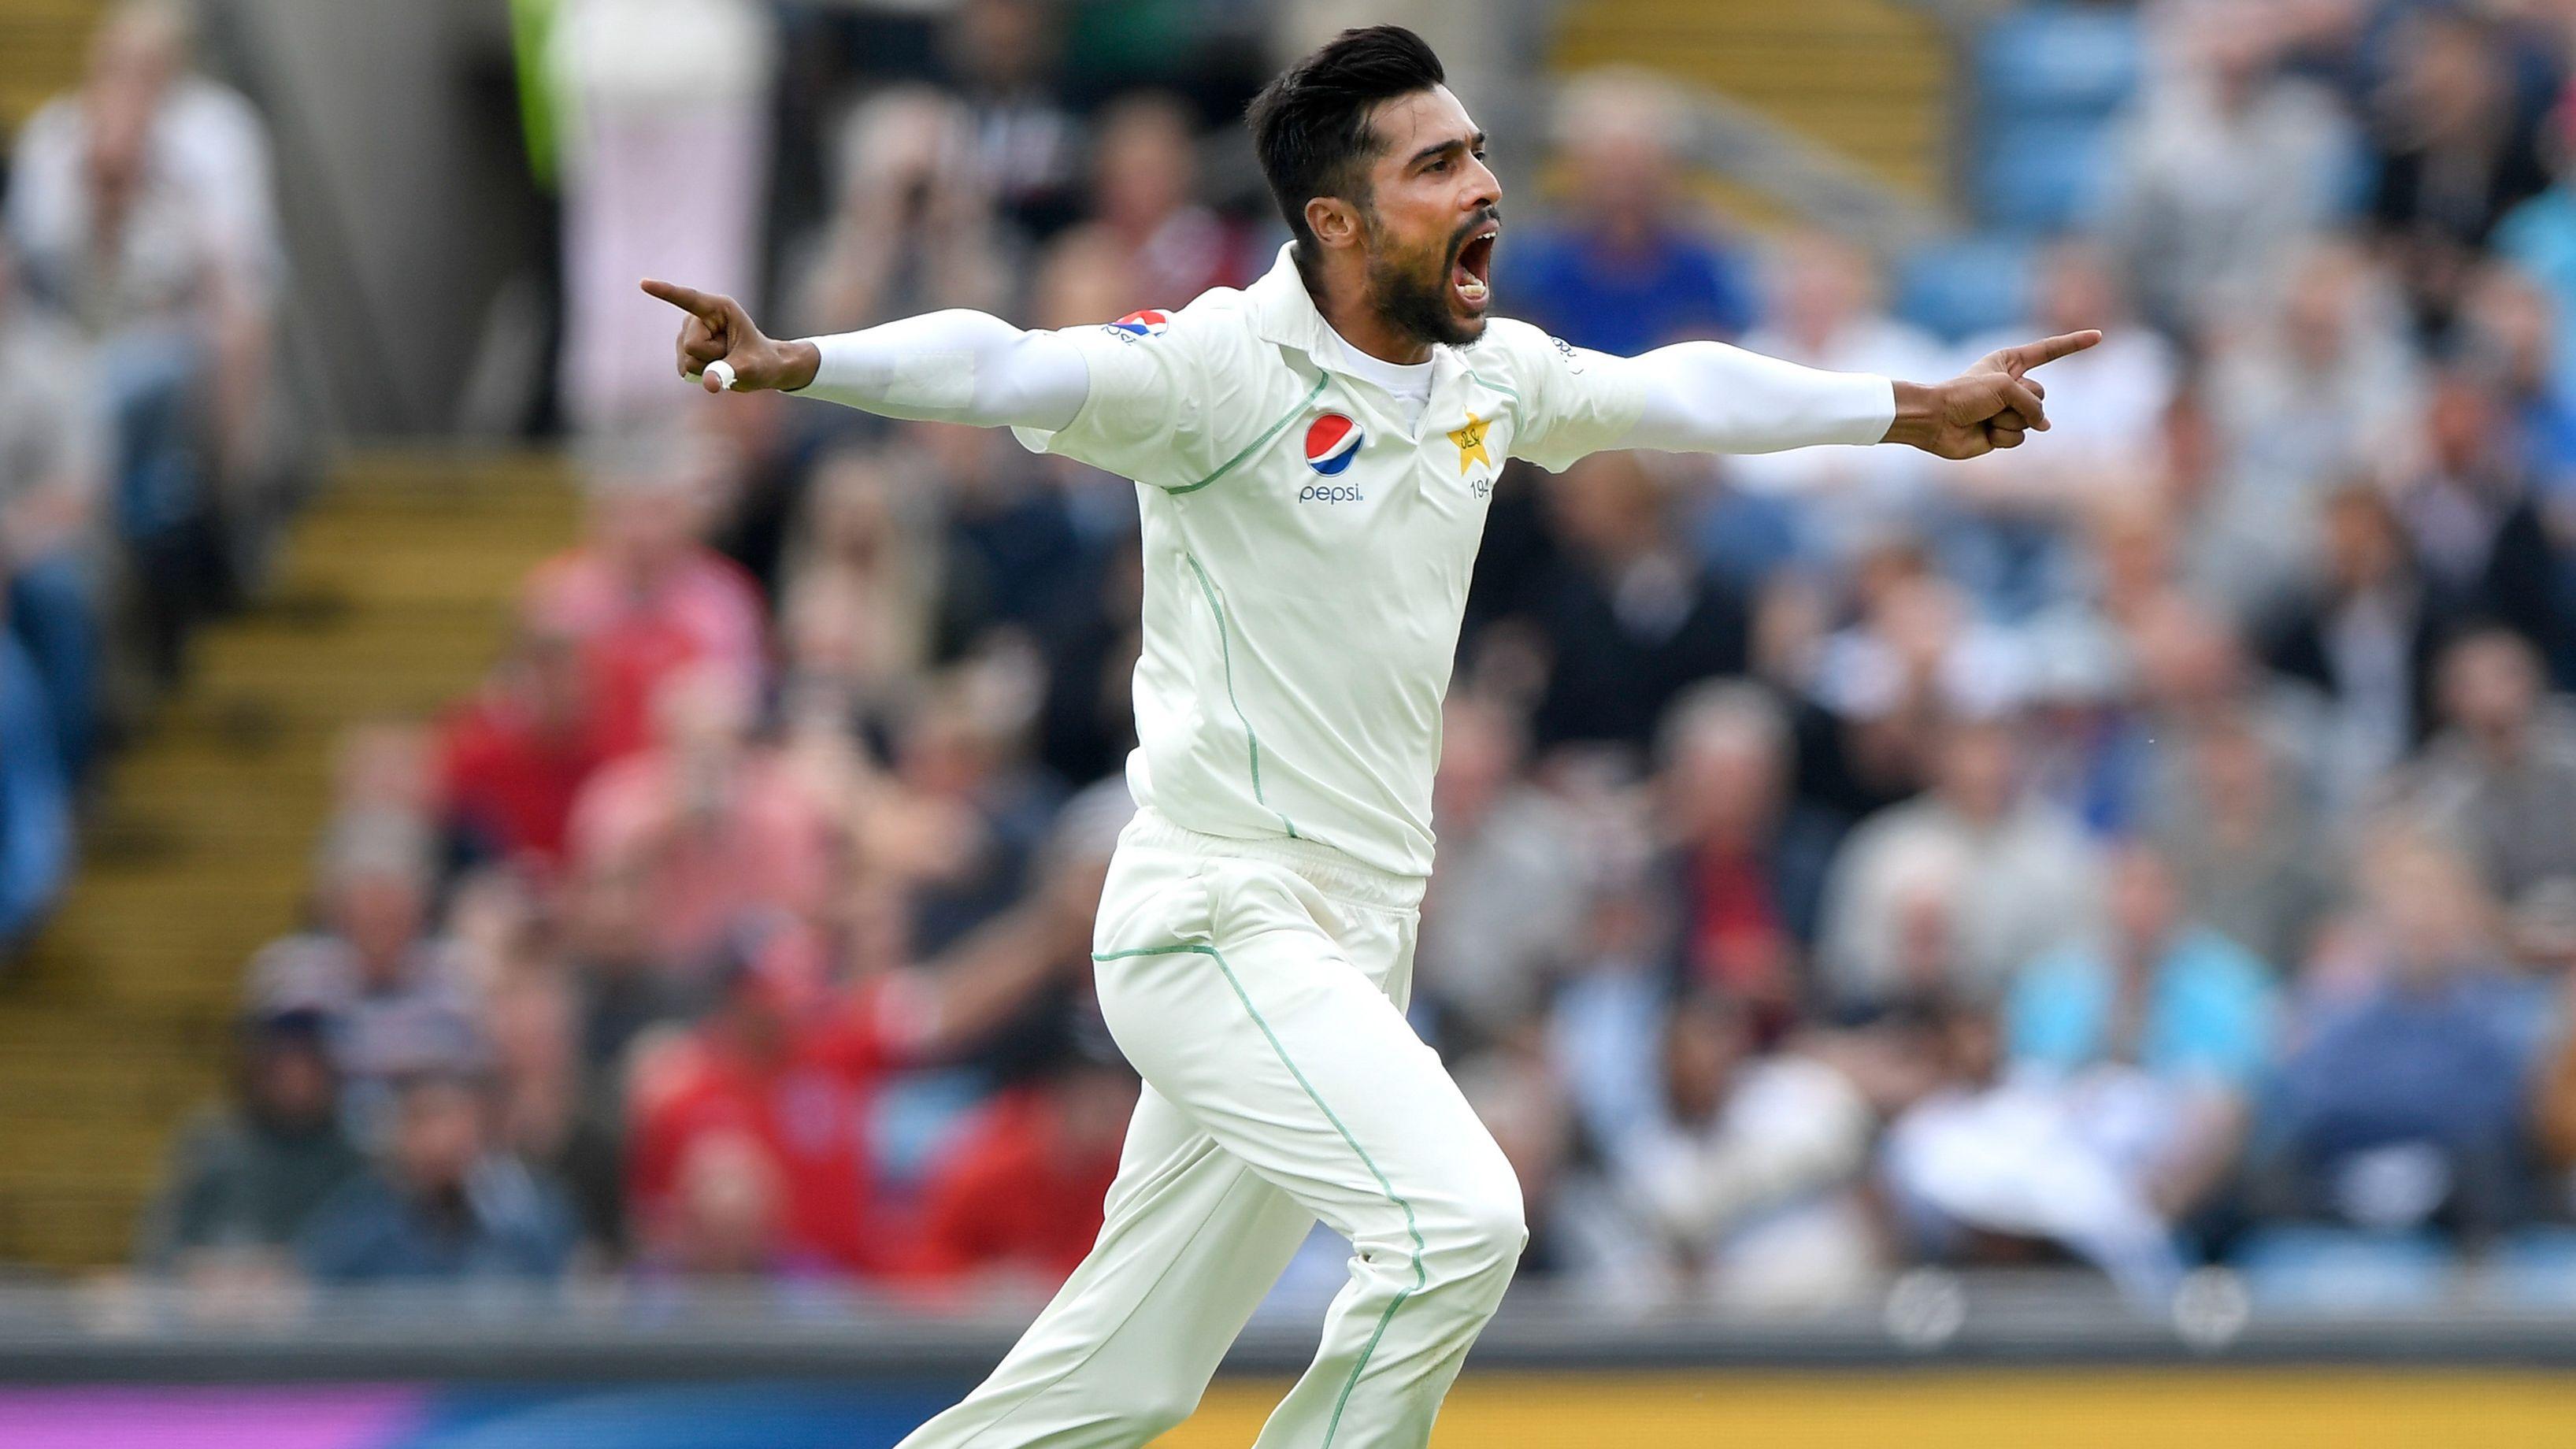 Pakistan star Mohammad Amir retires from international cricket, citing 'mental torture'